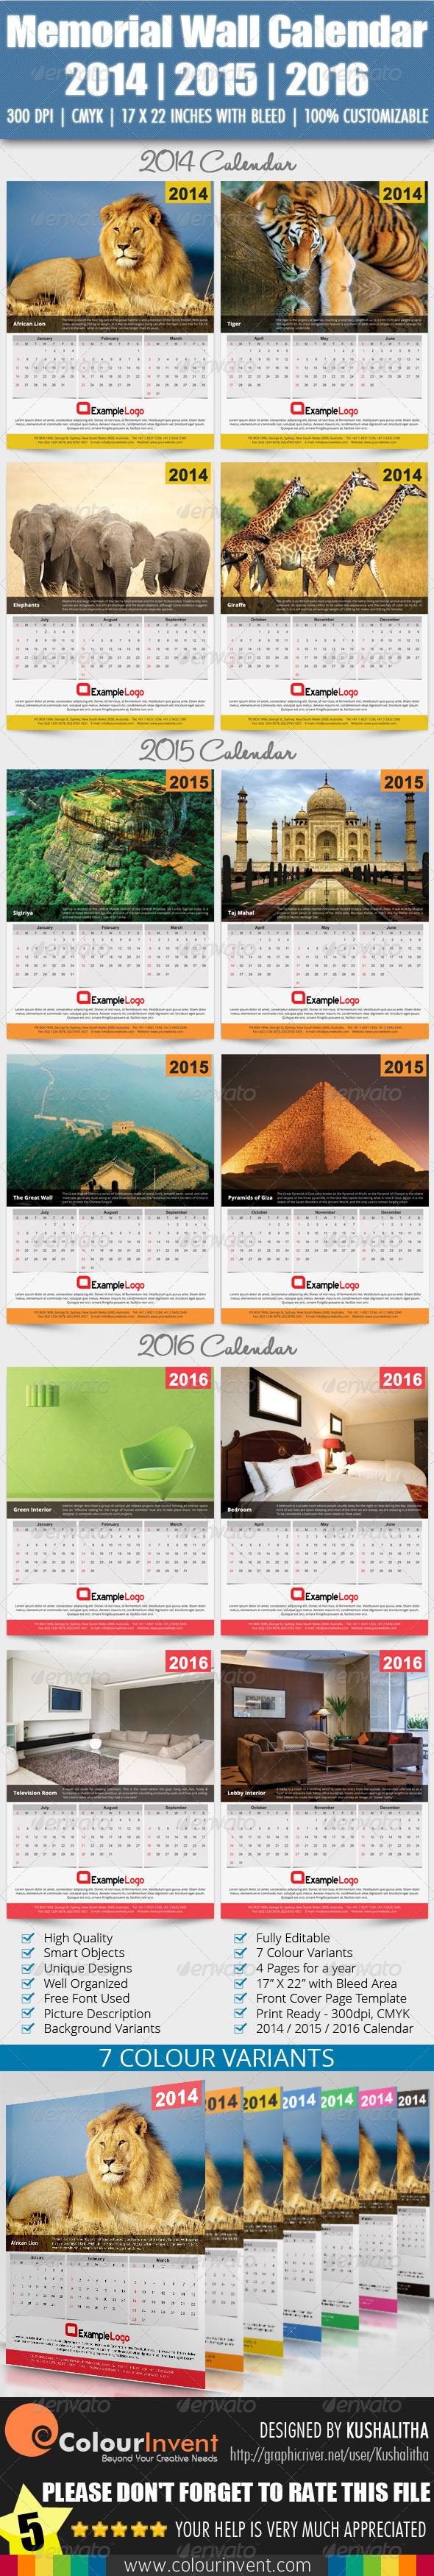 Memorial Wall Calendar 2014 | 2015 | 2016